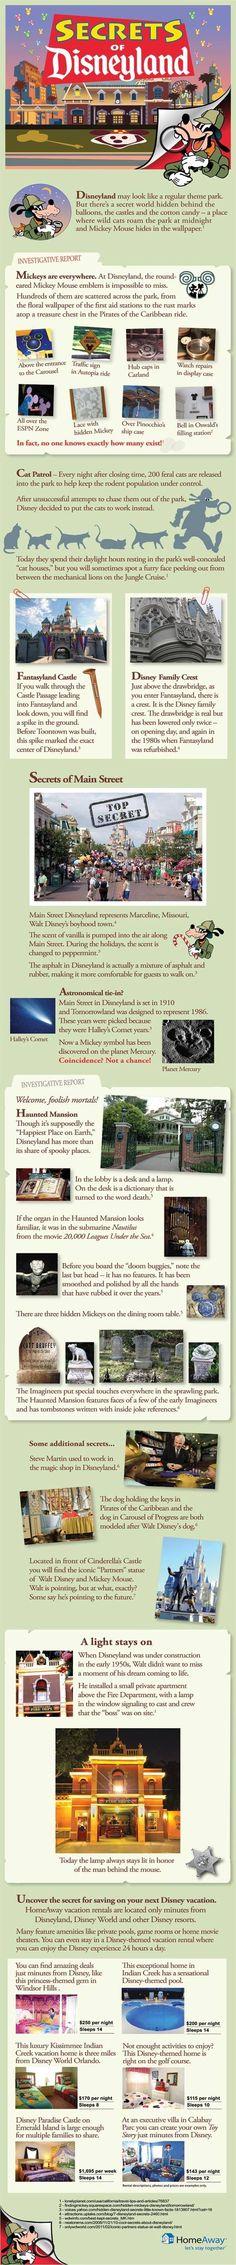 disneyland secrets | Family Vacation Ideas